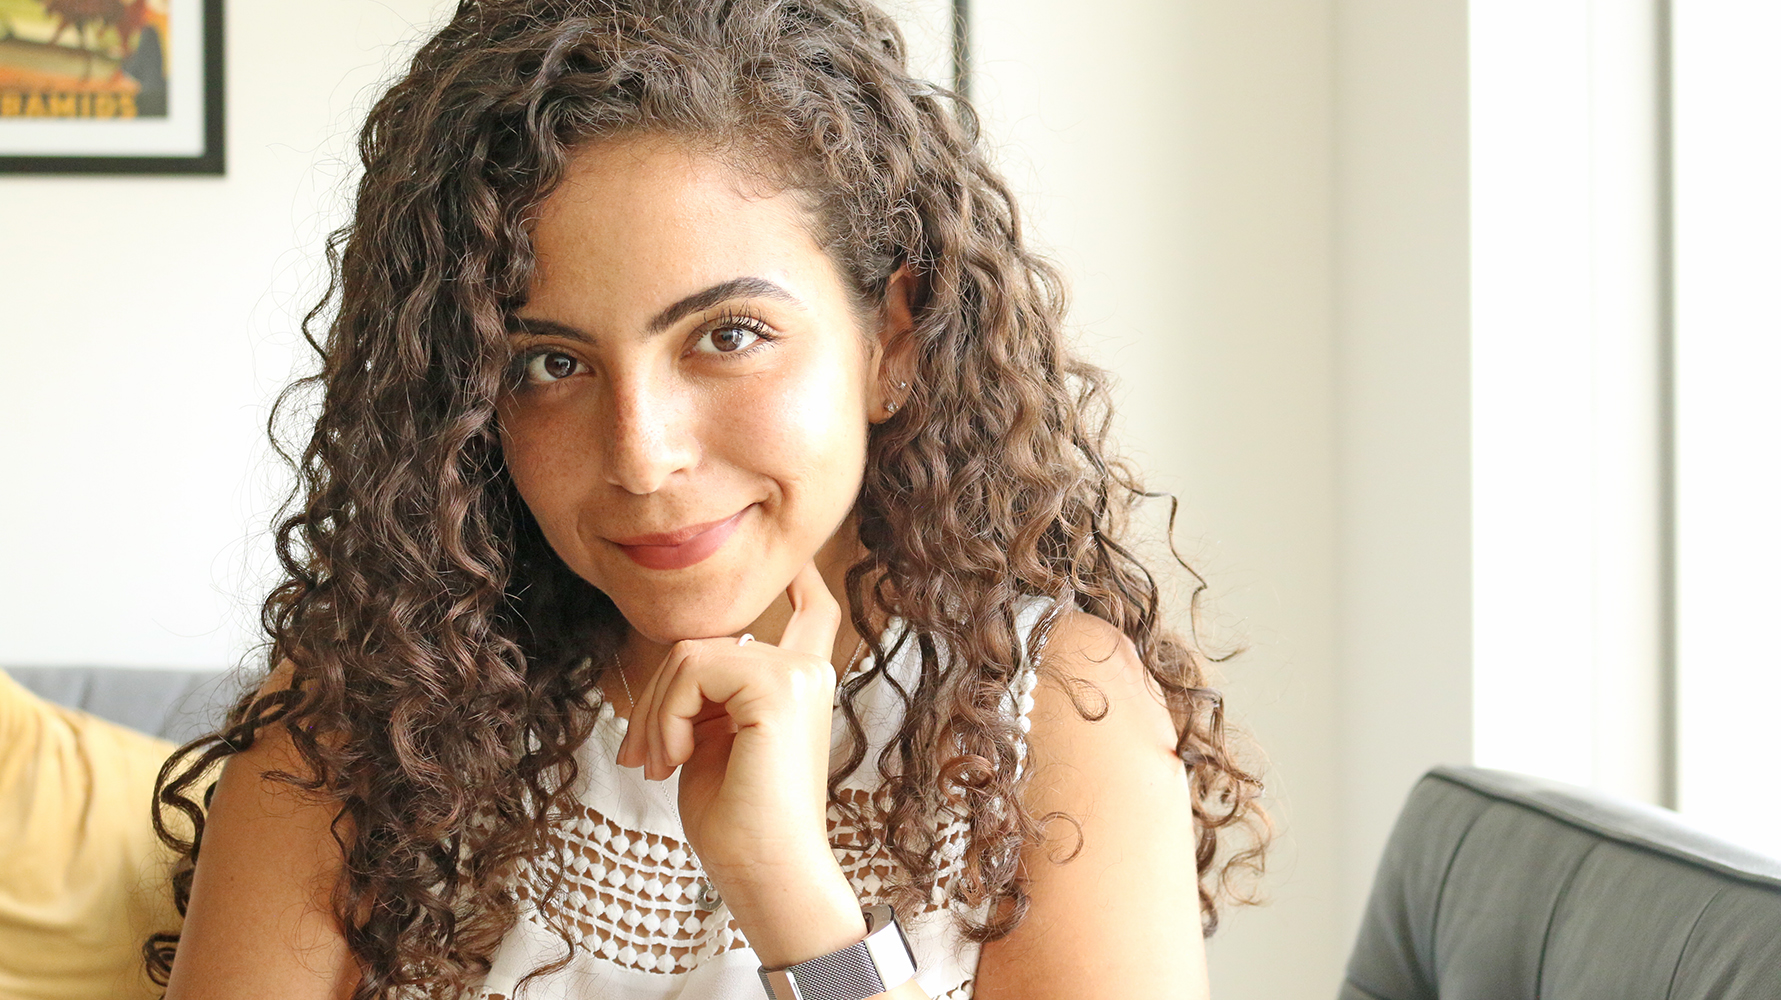 Meet our Guest Writer… - Nada, founder of One Arab Vegan.